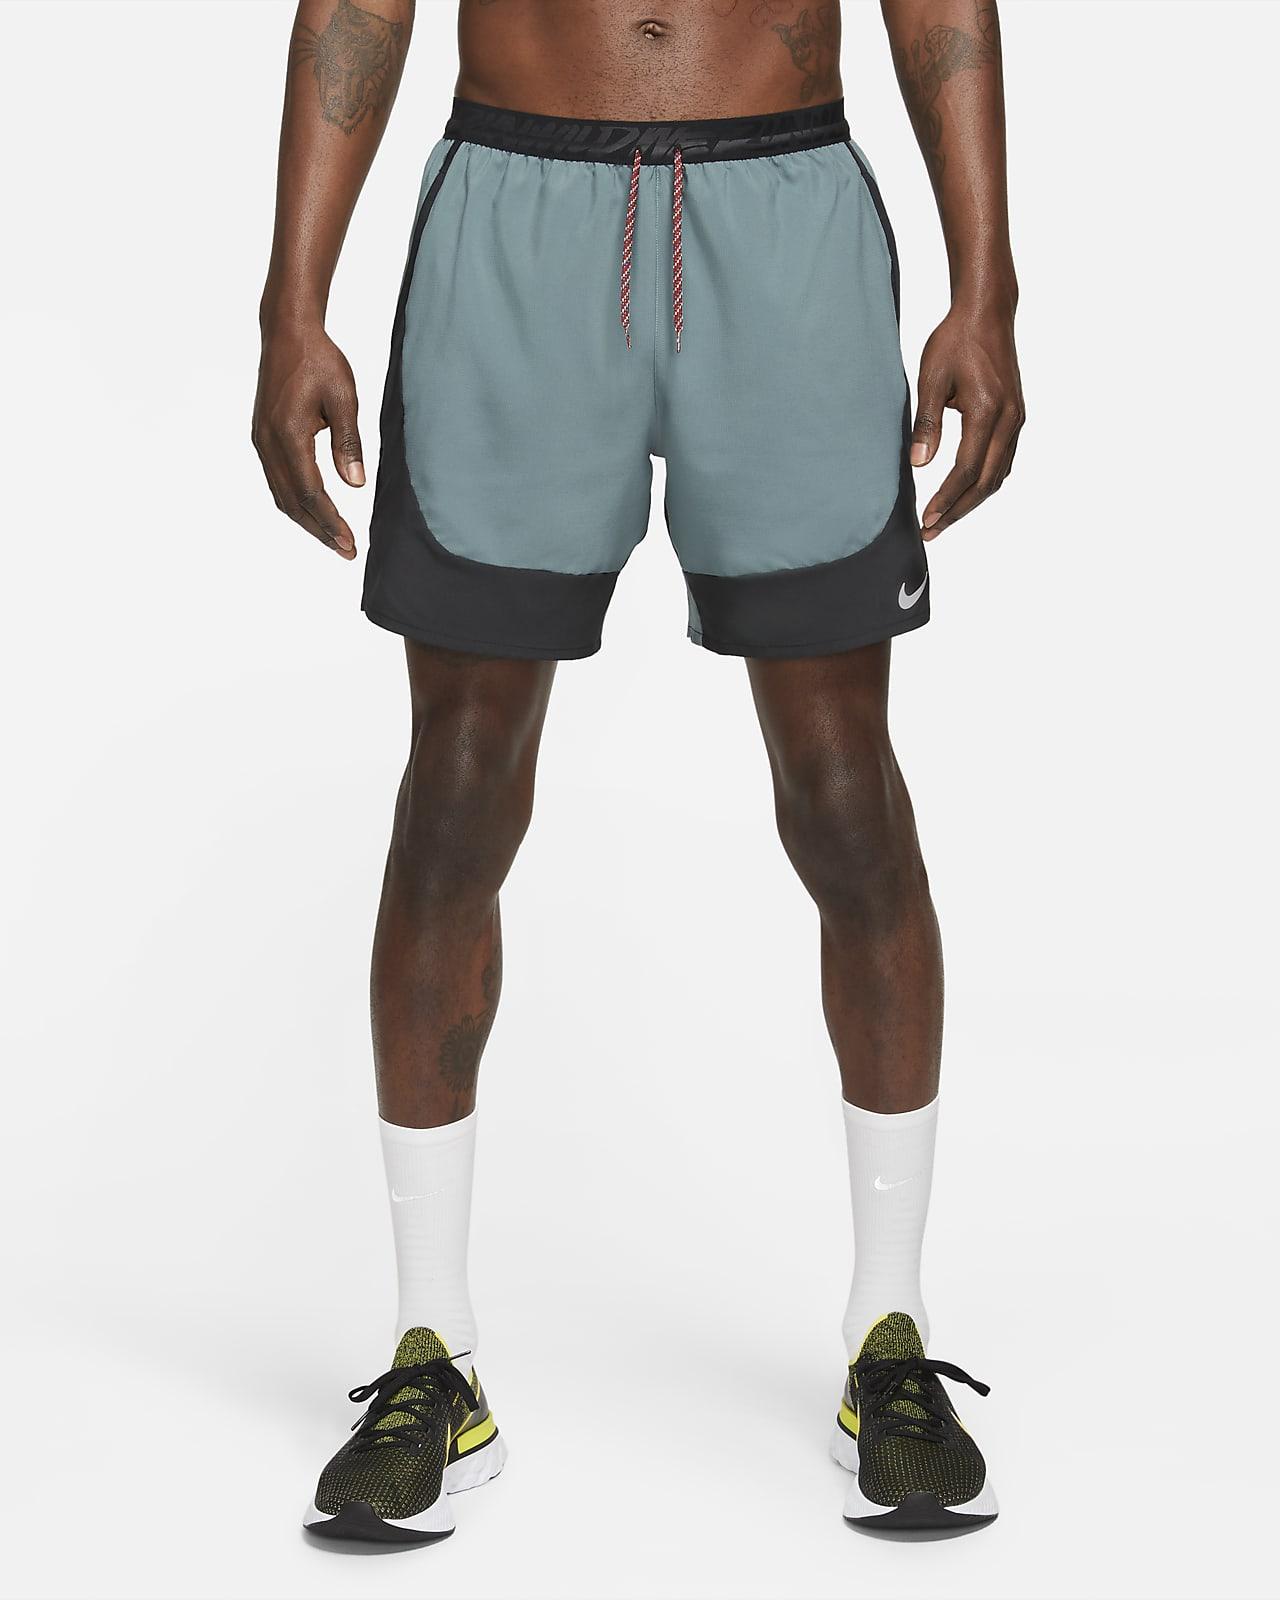 Nike Flex Stride Wild Run Men's Unlined Running Shorts